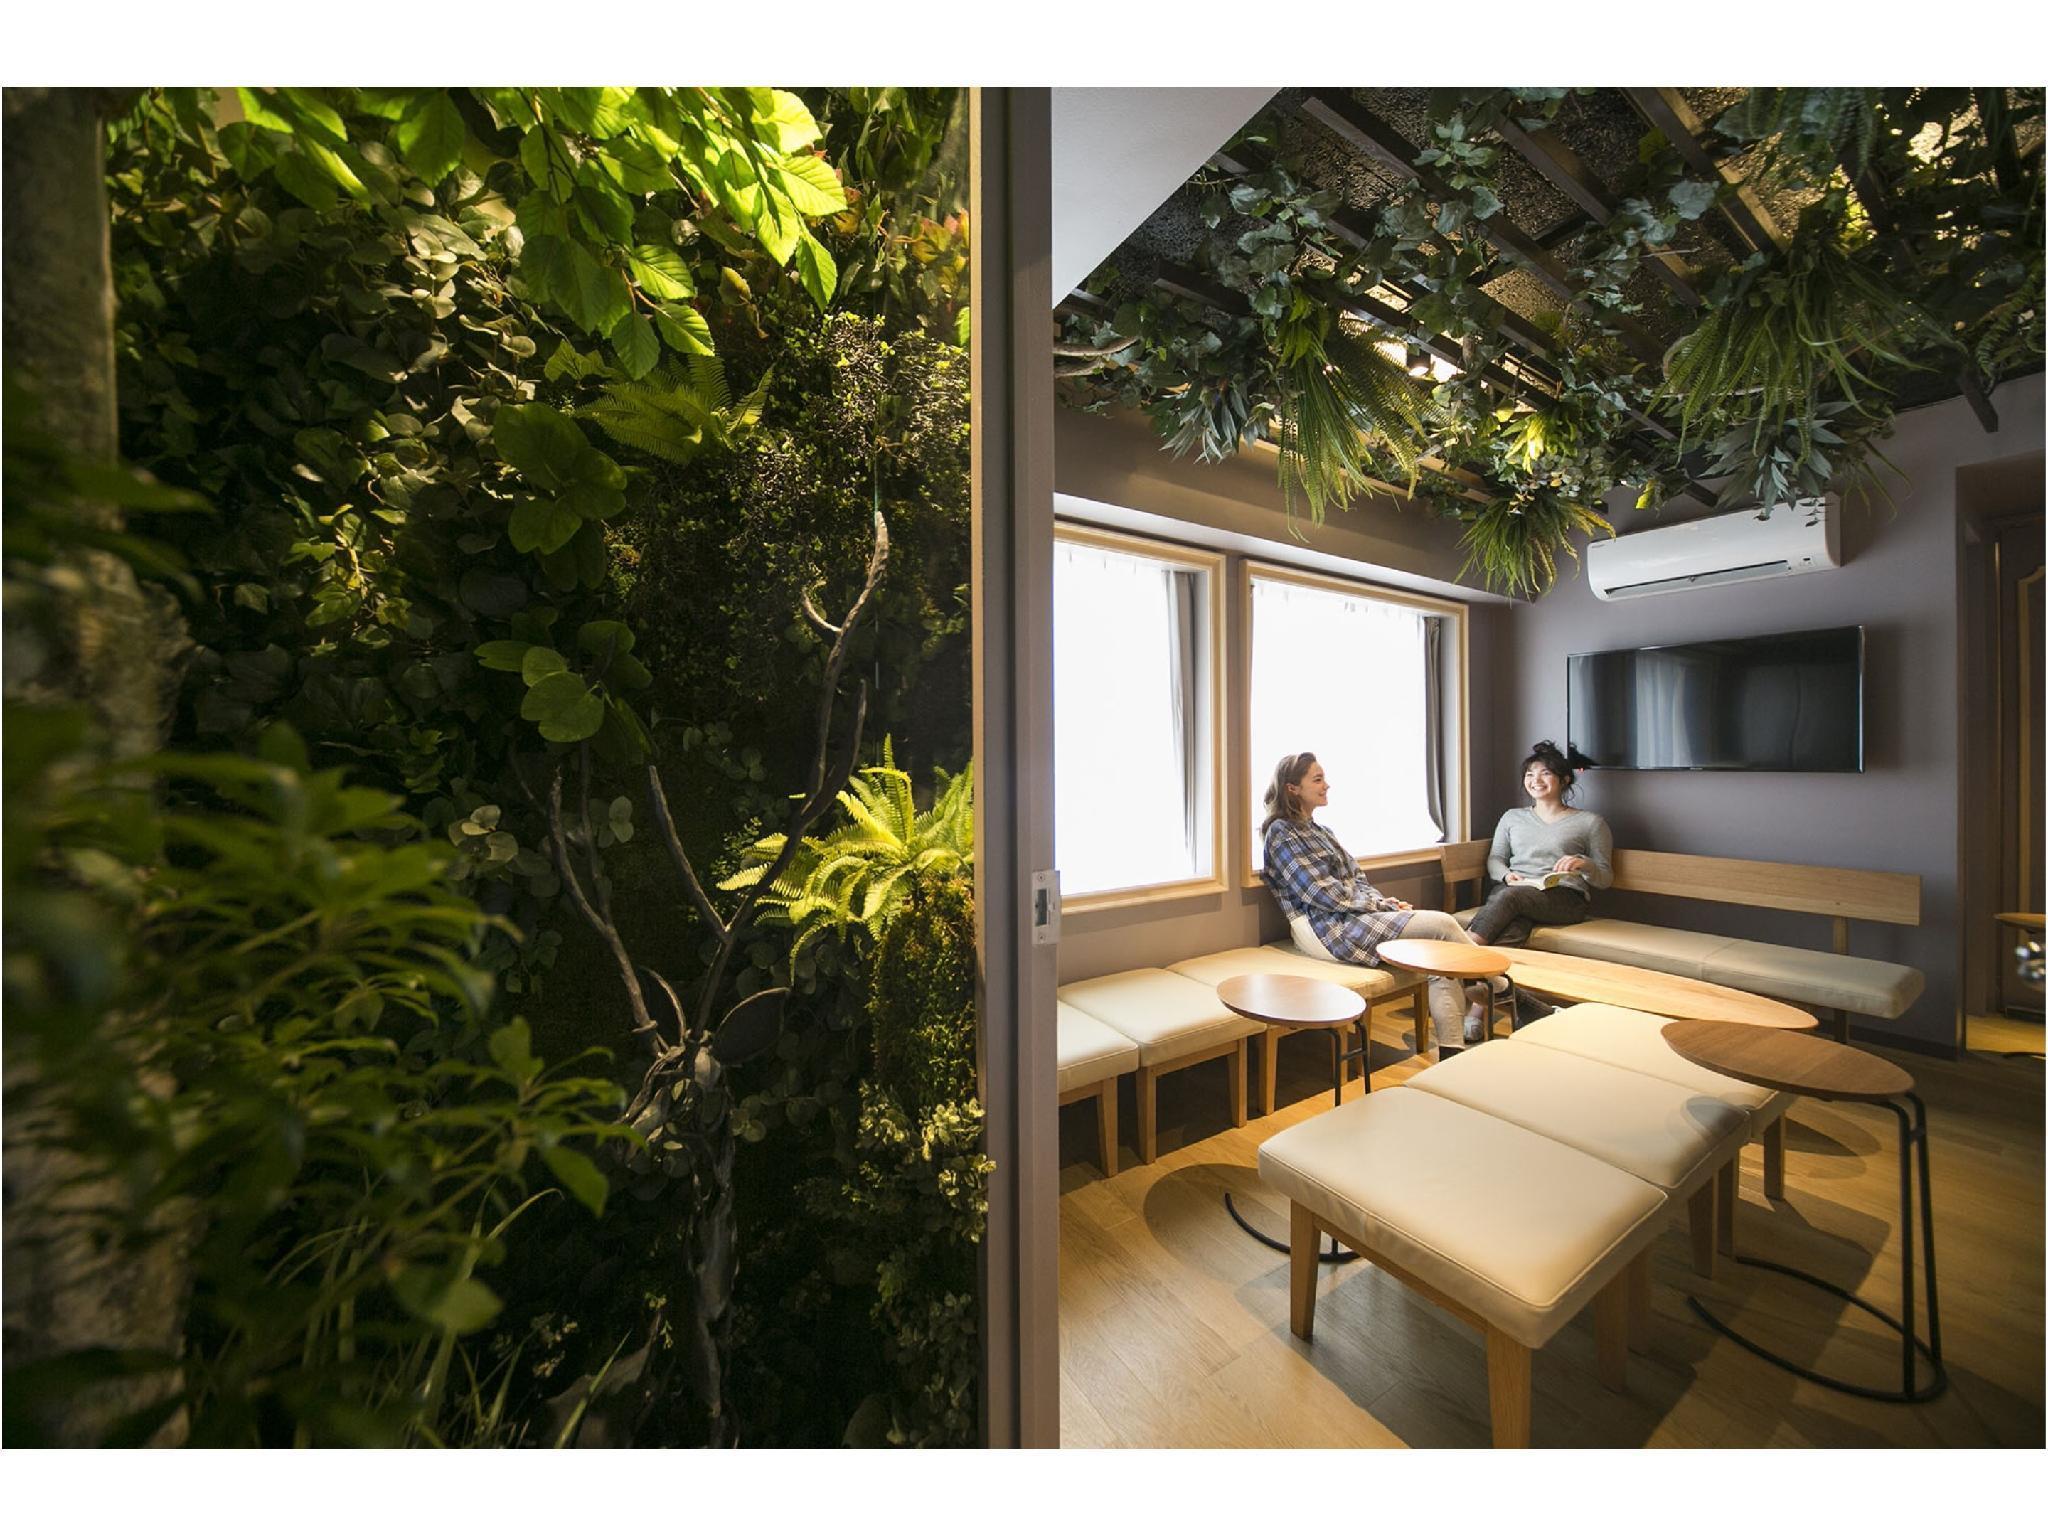 The Wardrobe Hostel FOREST Shimokitazawa